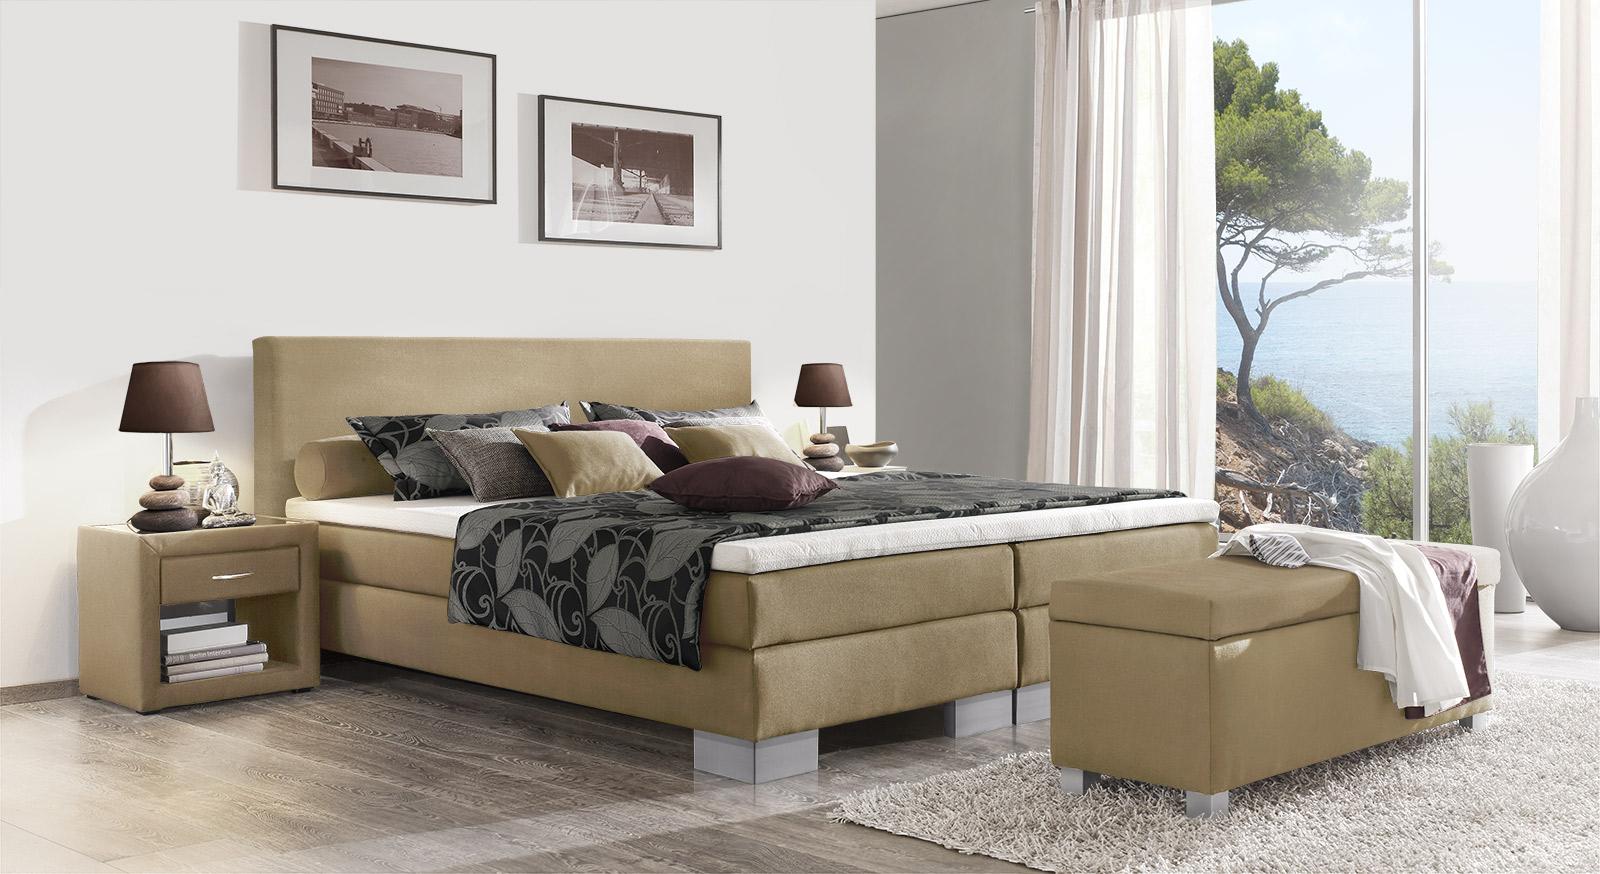 klassisches boxspringbett 180x200 cm in schwarz puebla. Black Bedroom Furniture Sets. Home Design Ideas